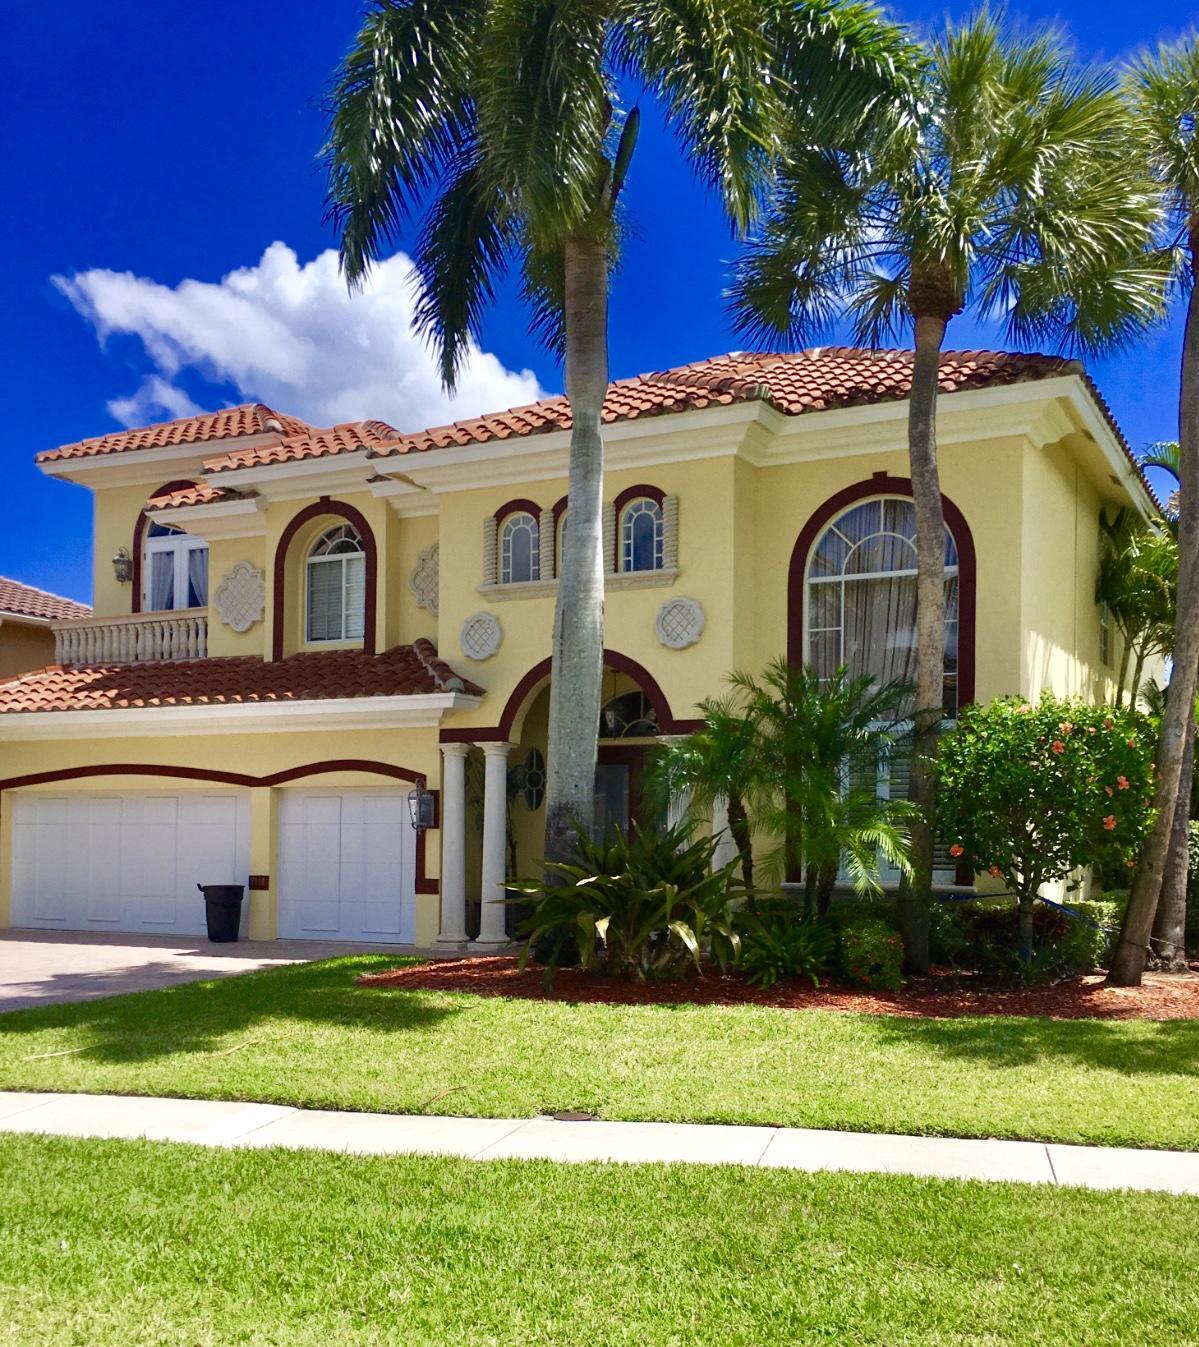 9718 Coronado Lake Drive  Boynton Beach FL 33437